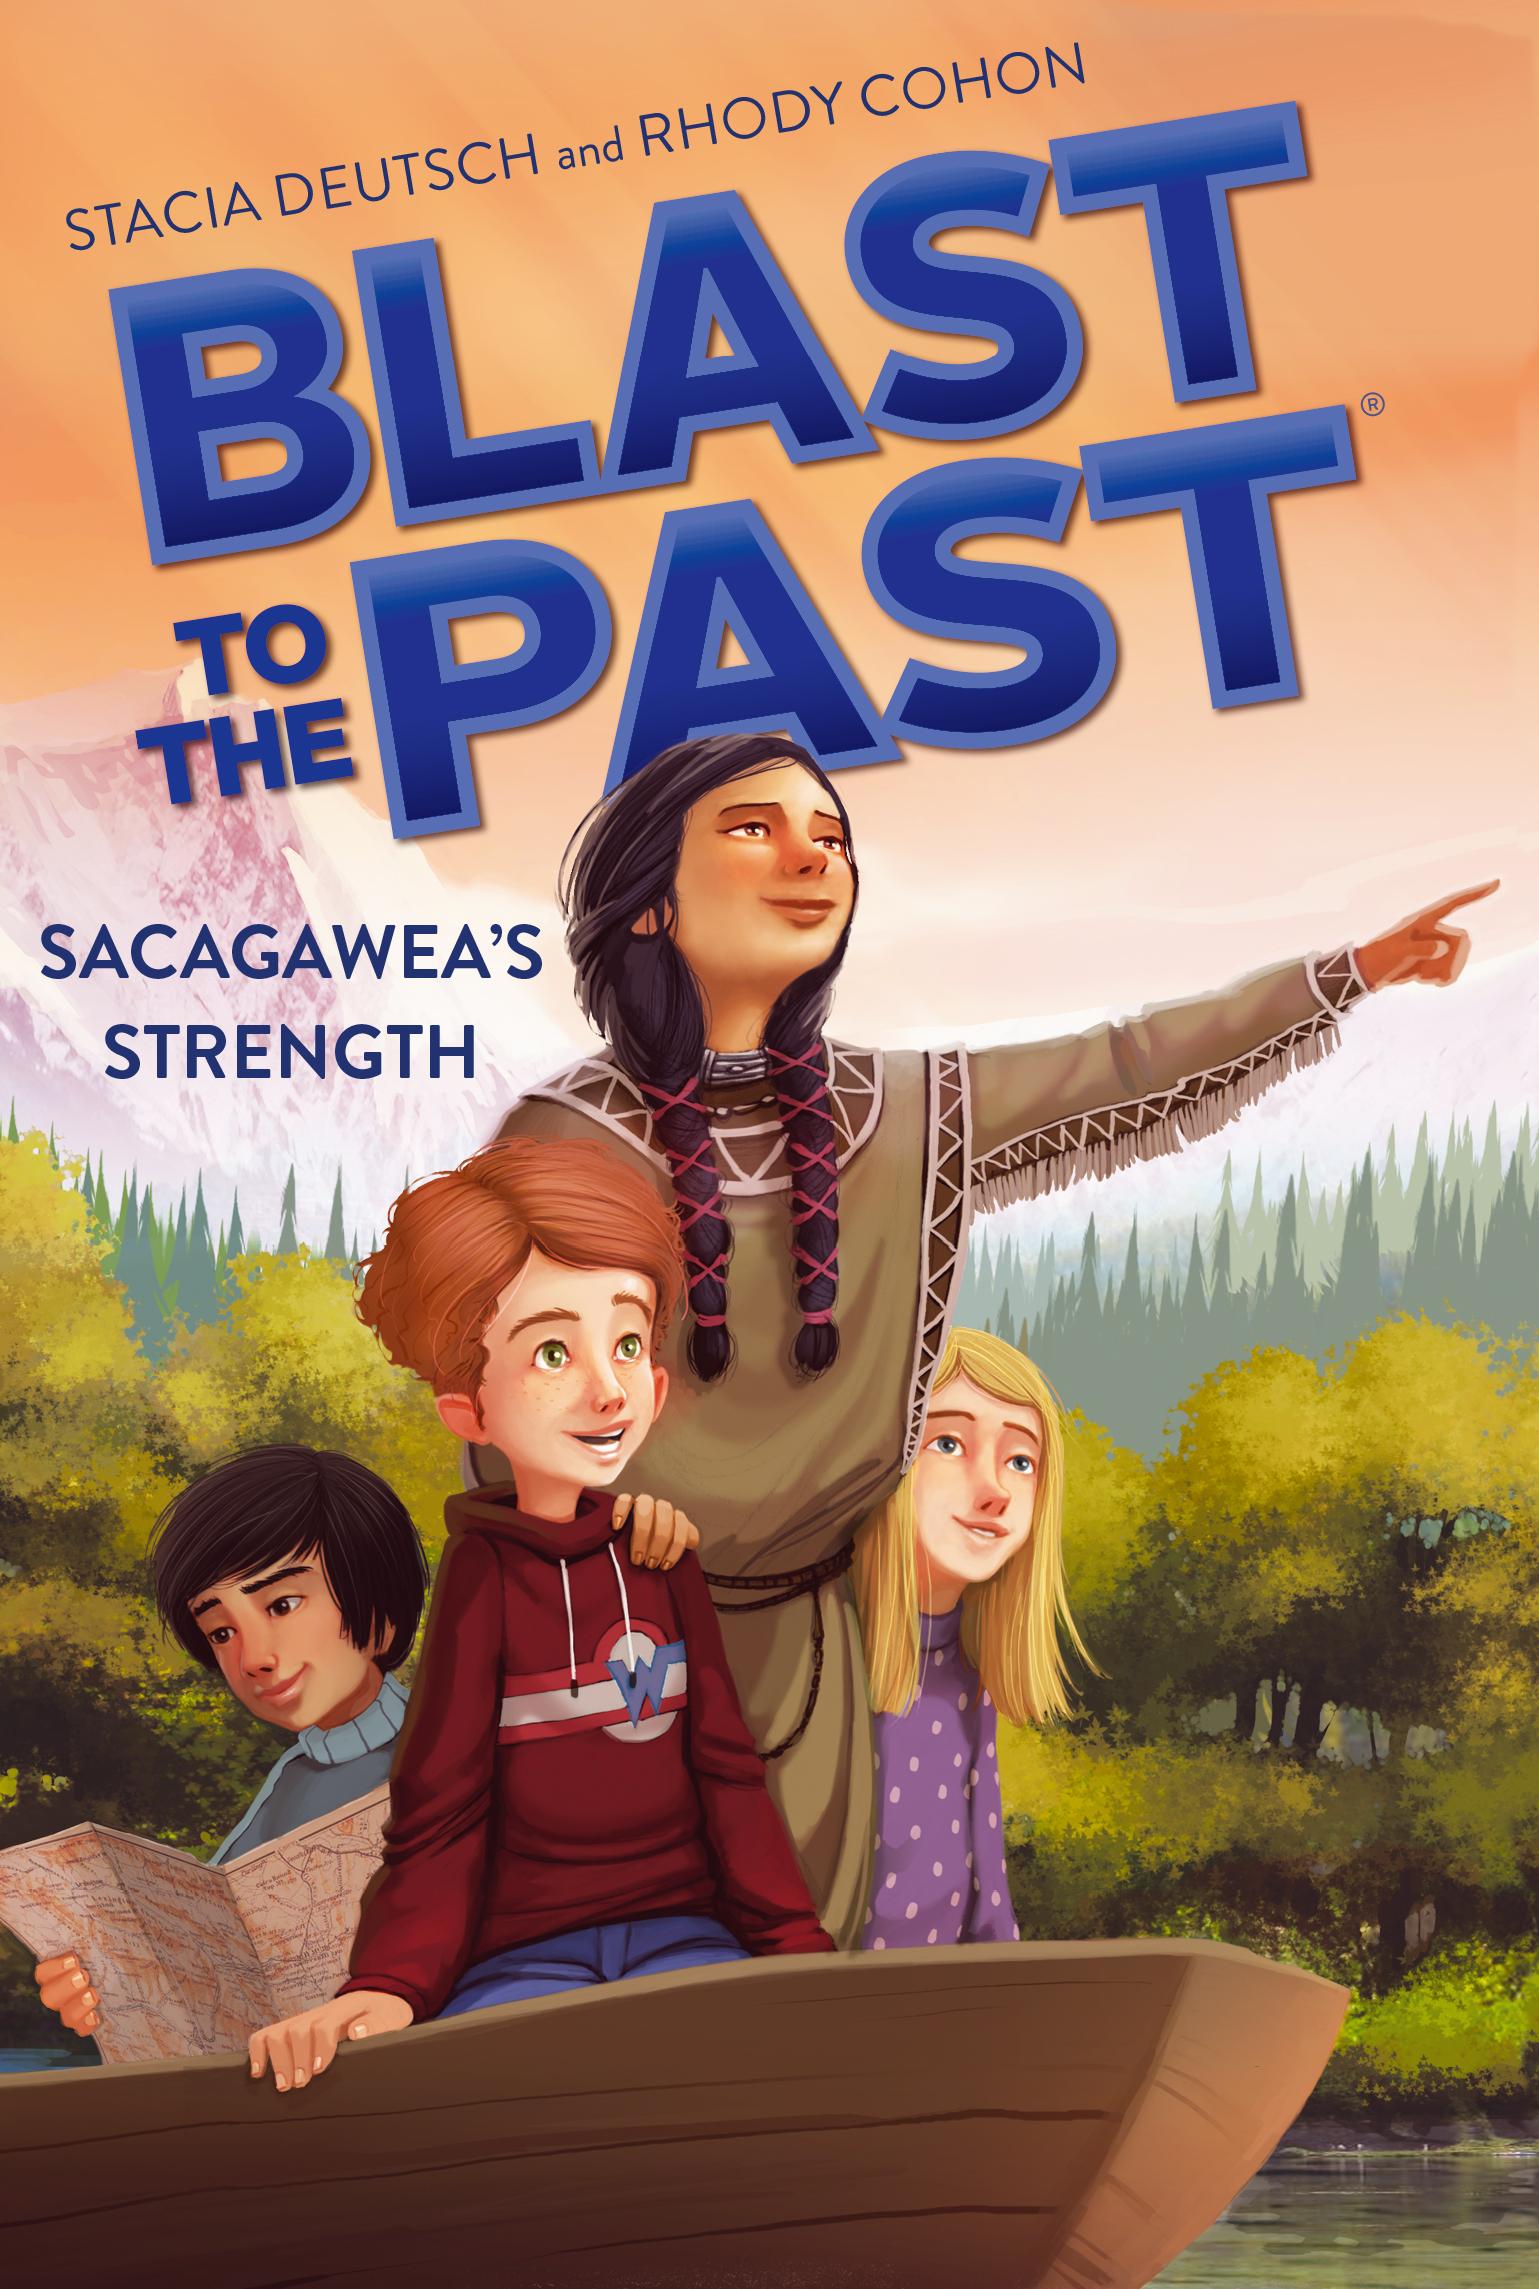 Sacagaweas strength 9781442495388 hr